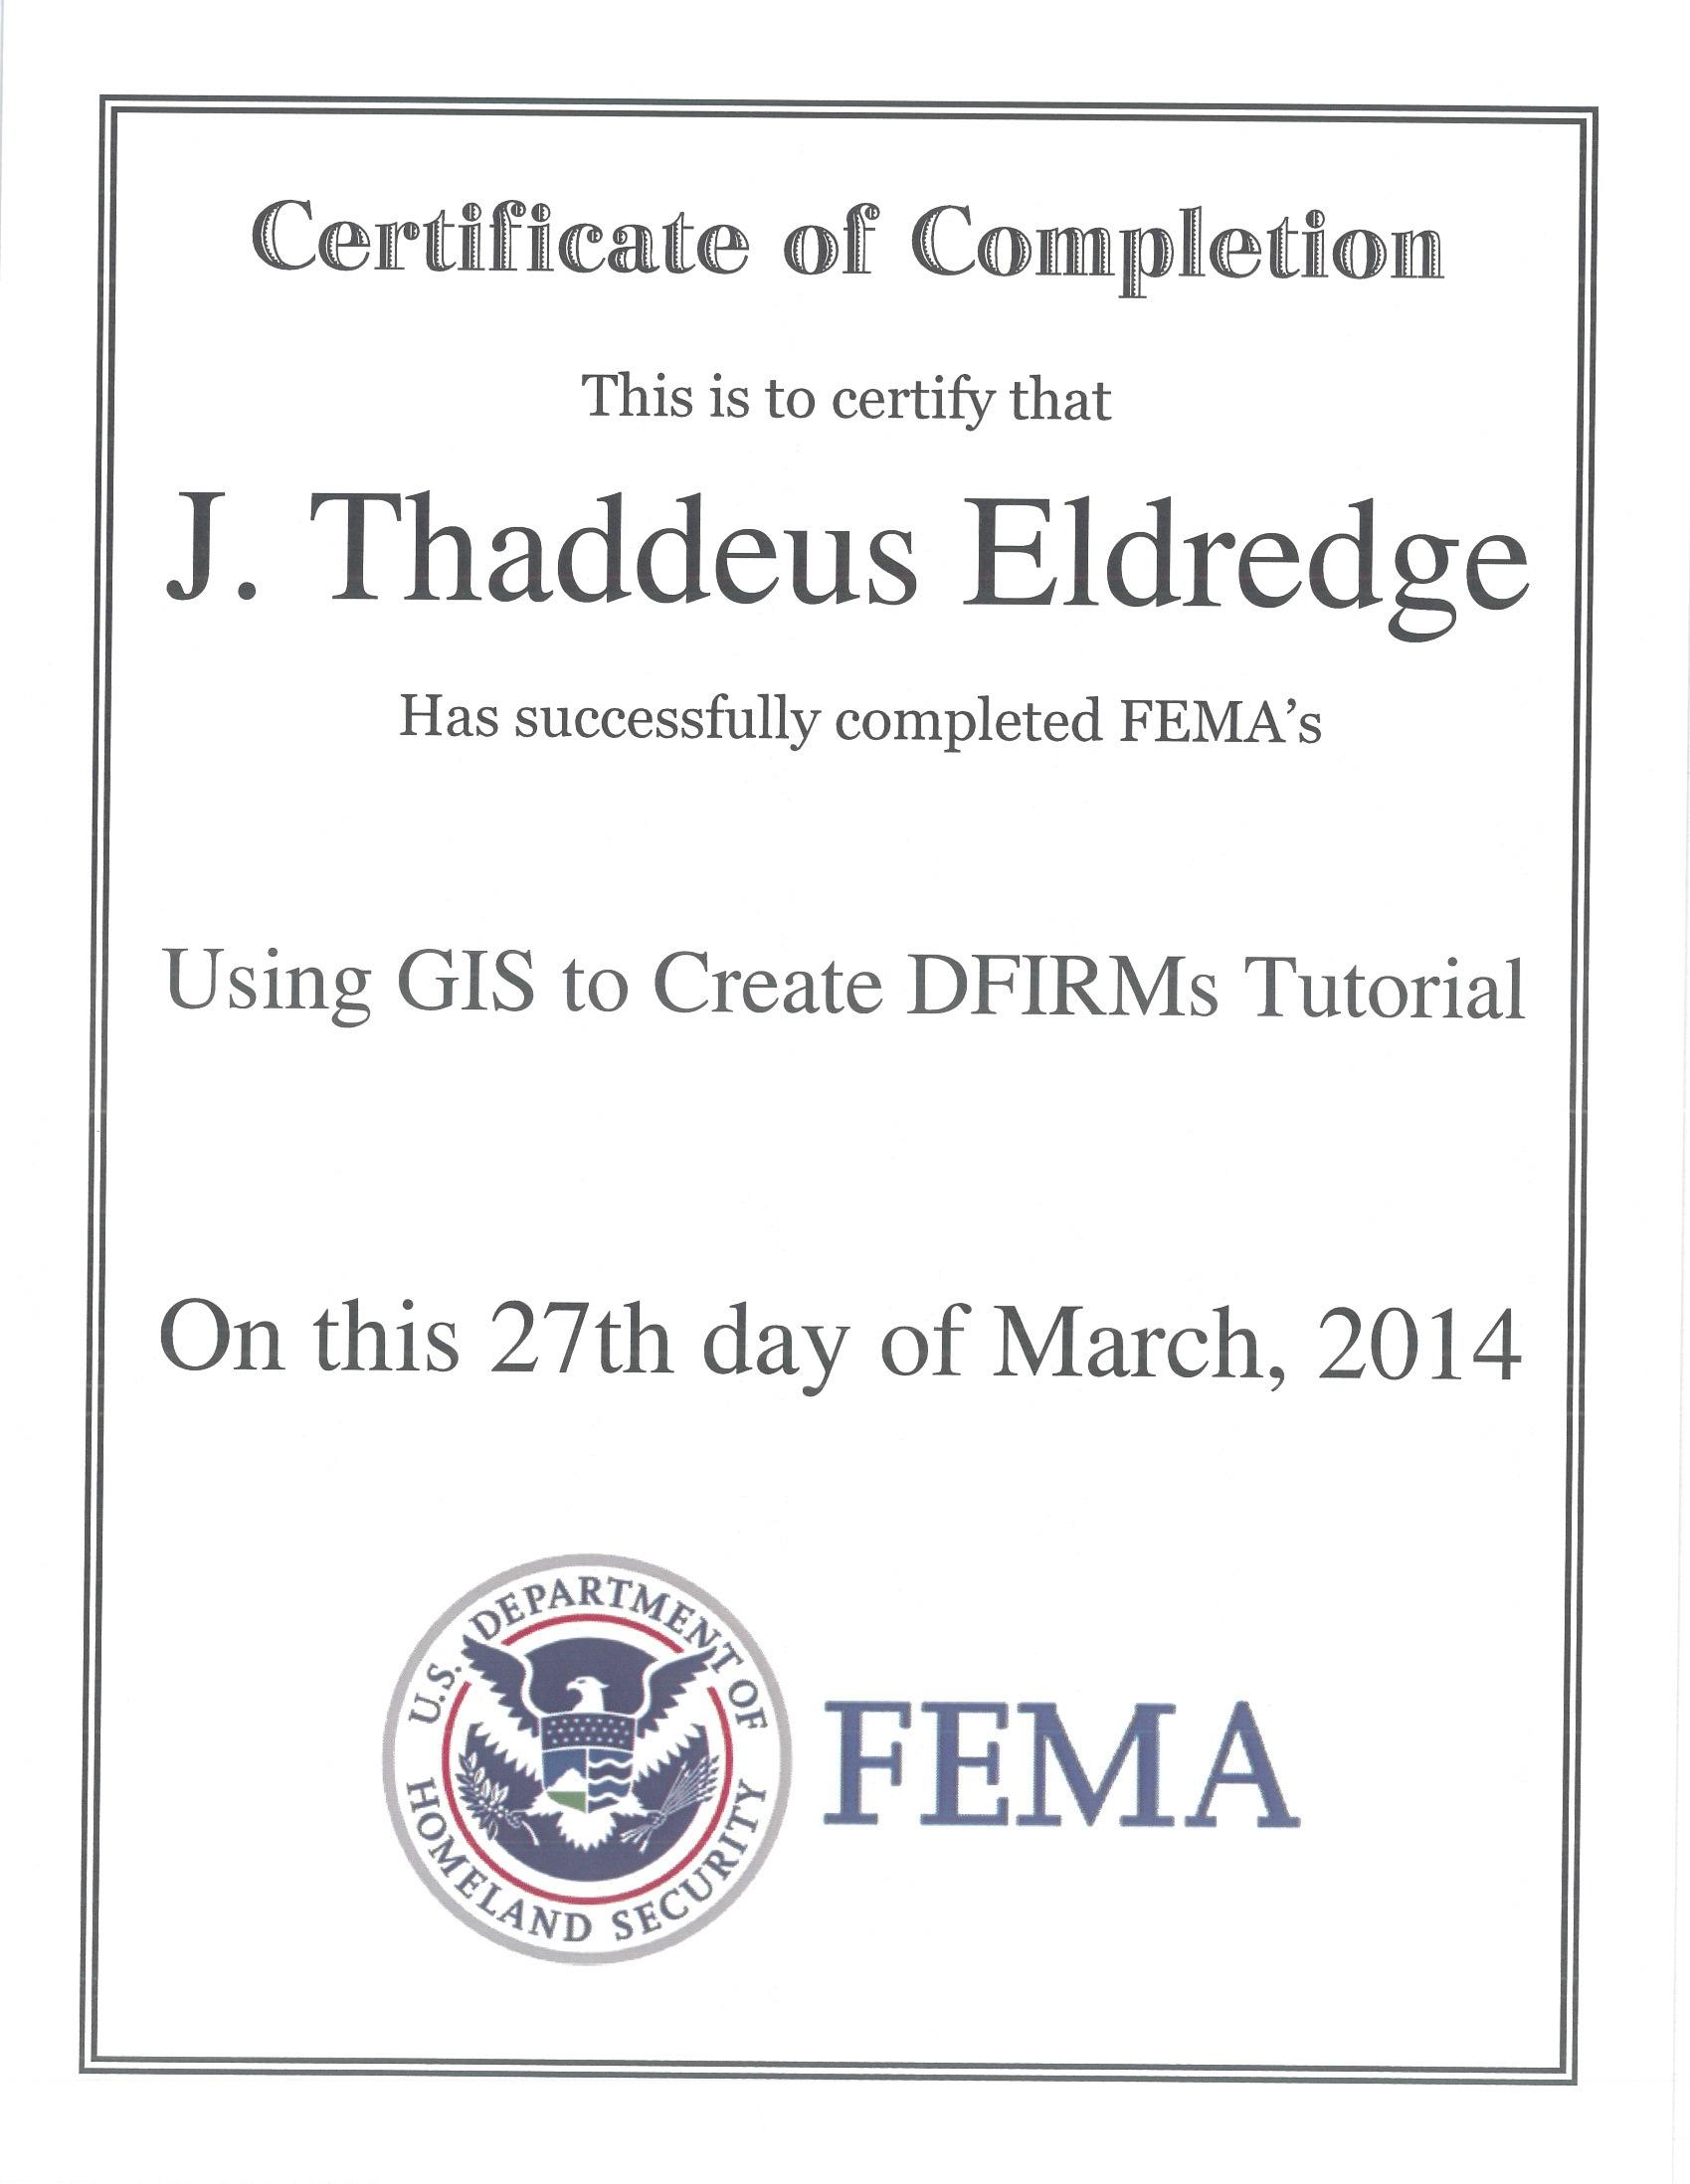 2014-03-27 FEMA GIS.jpg